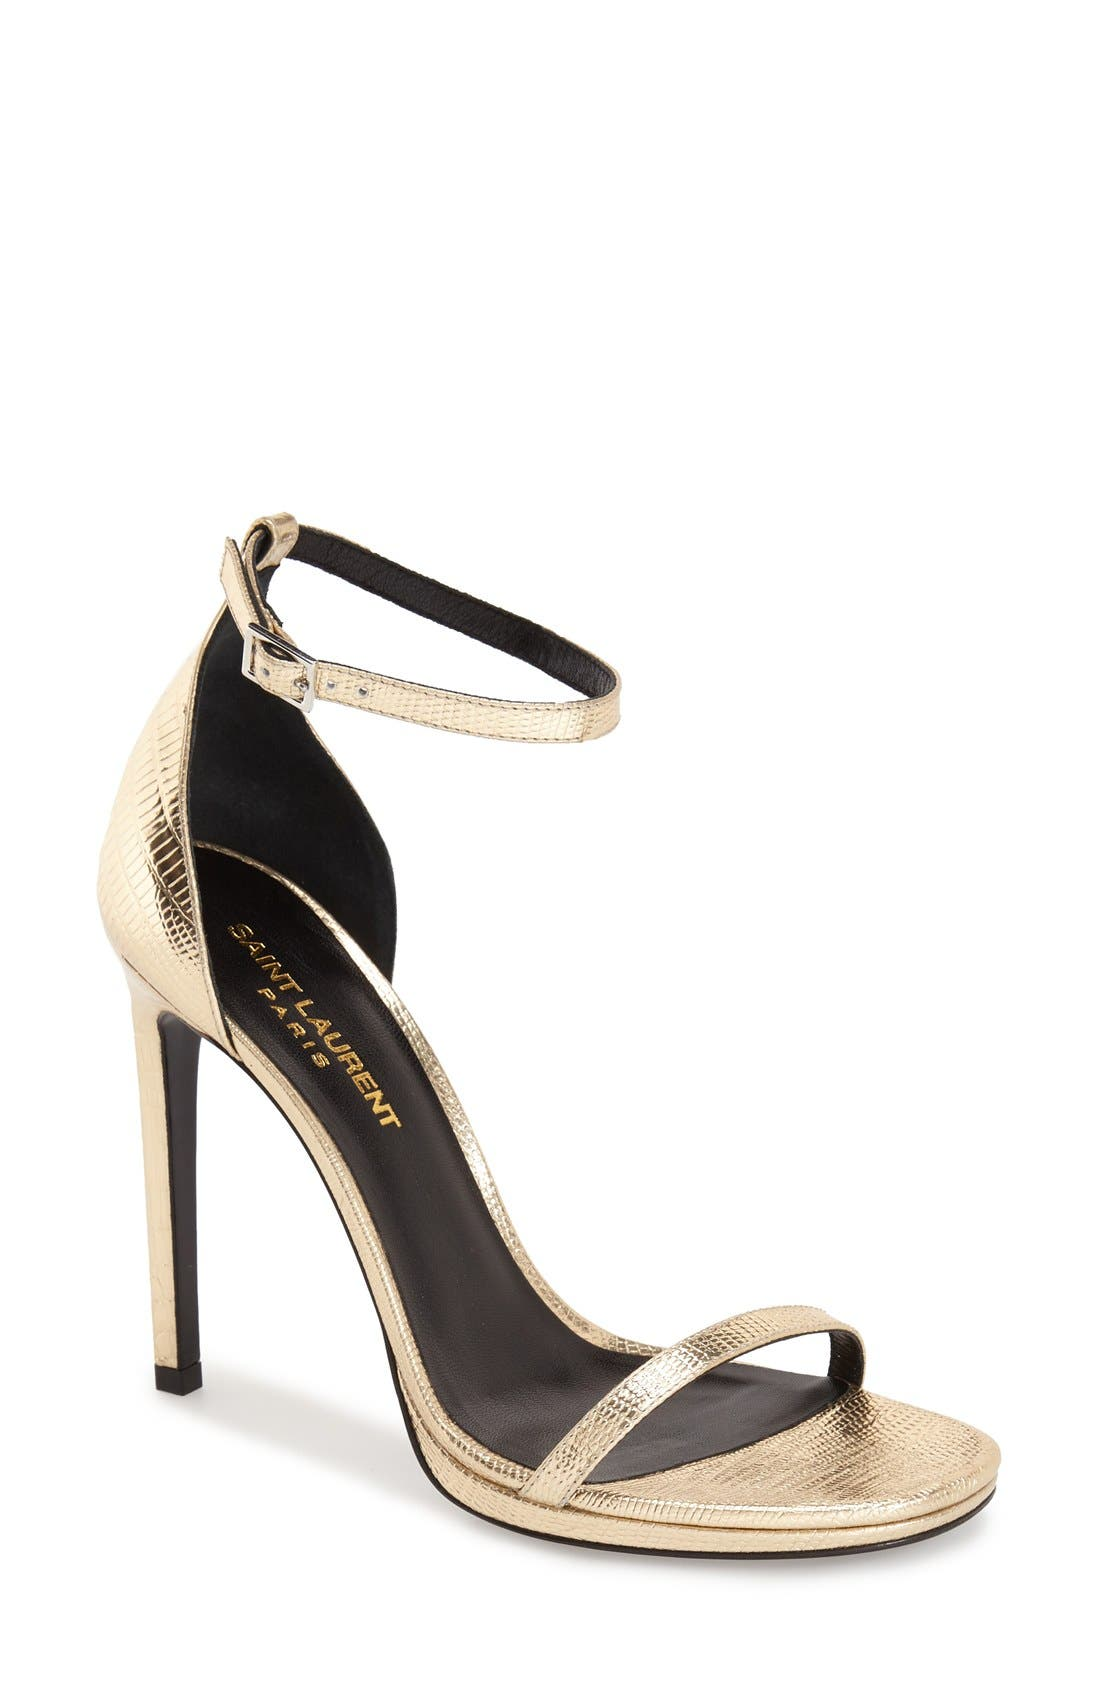 Alternate Image 1 Selected - Saint Laurent 'Jane' Ankle Strap Leather Sandal (Women)